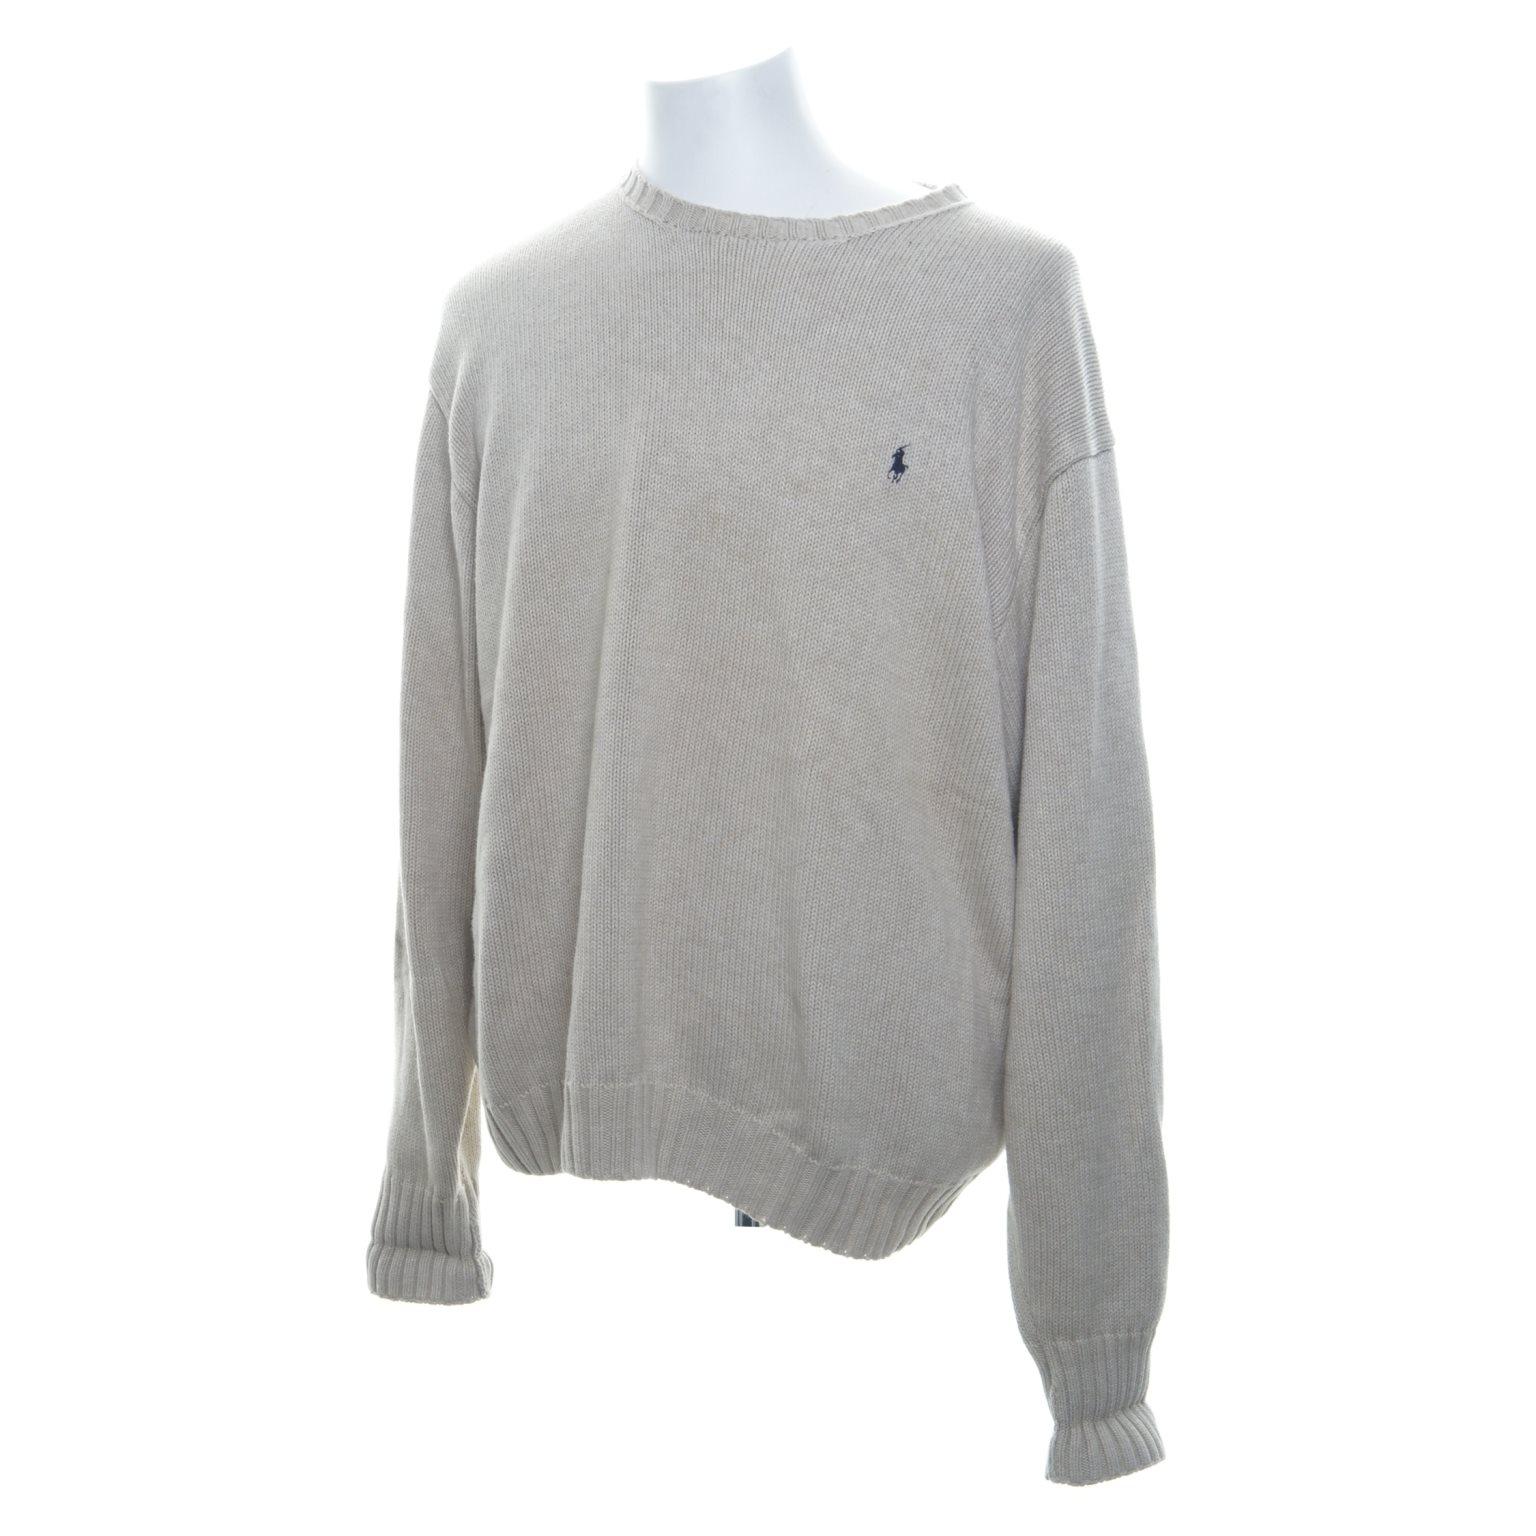 Polo Ralph Lauren, Kofta, Strl: XL, Beige